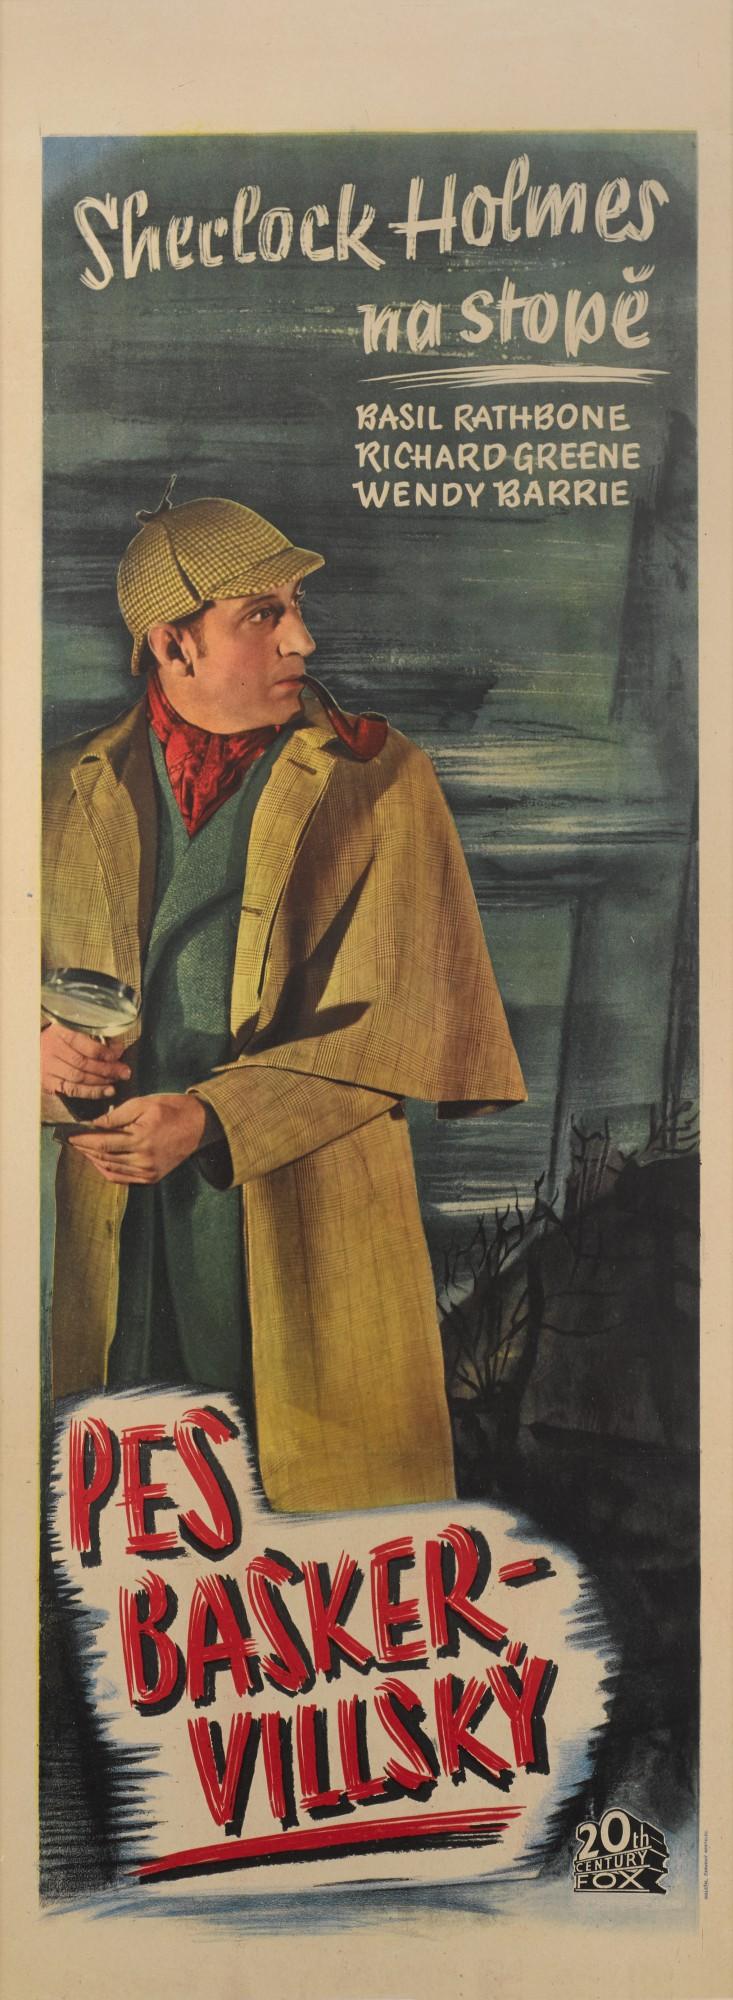 HOUND OF THE BASKERVILLES / PES BASKER-VILLSKY (1939) POSTER, CZECHOSLOVAKIAN